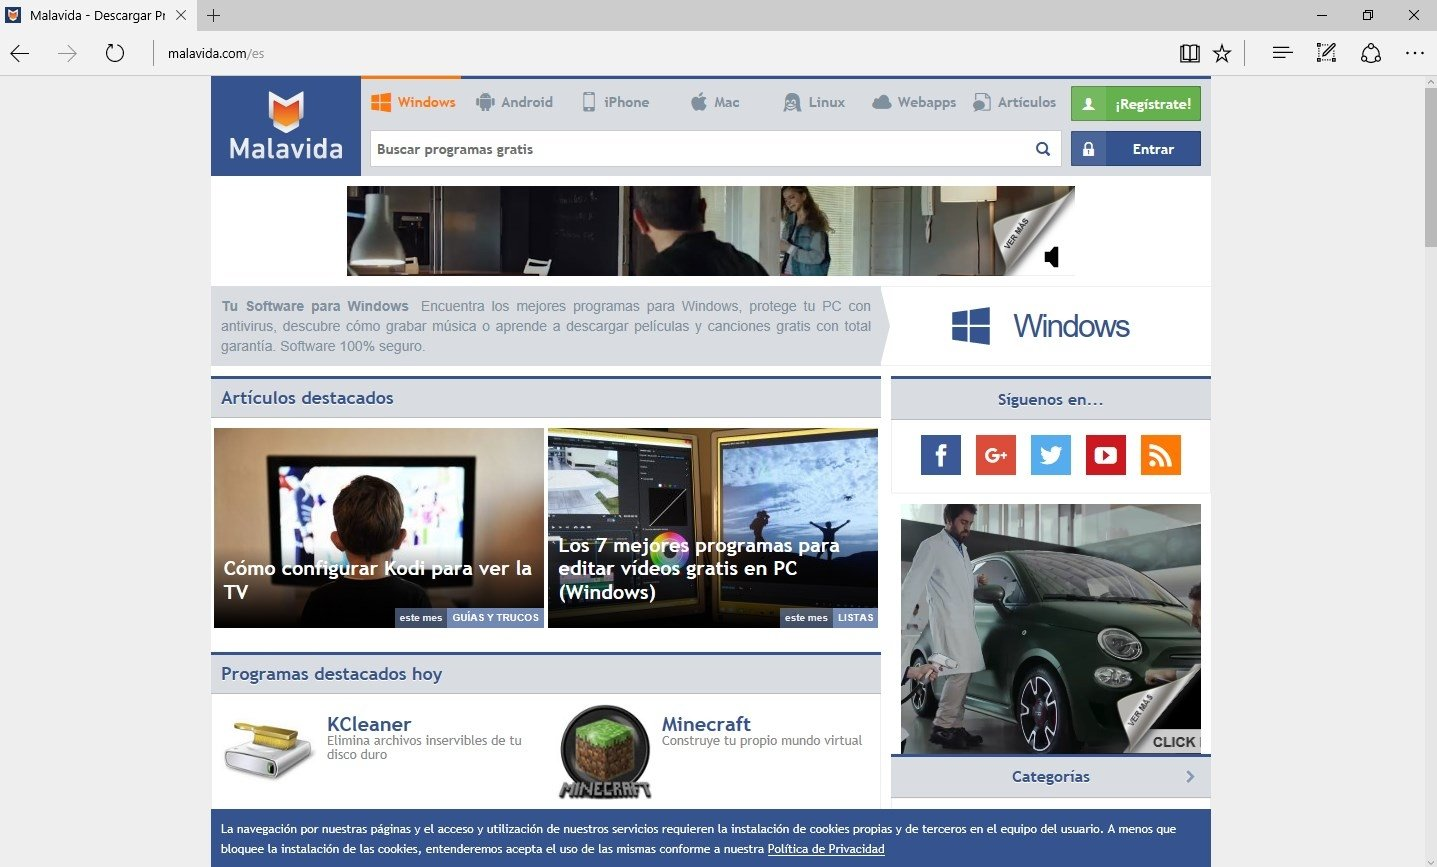 Microsoft Edge image 8